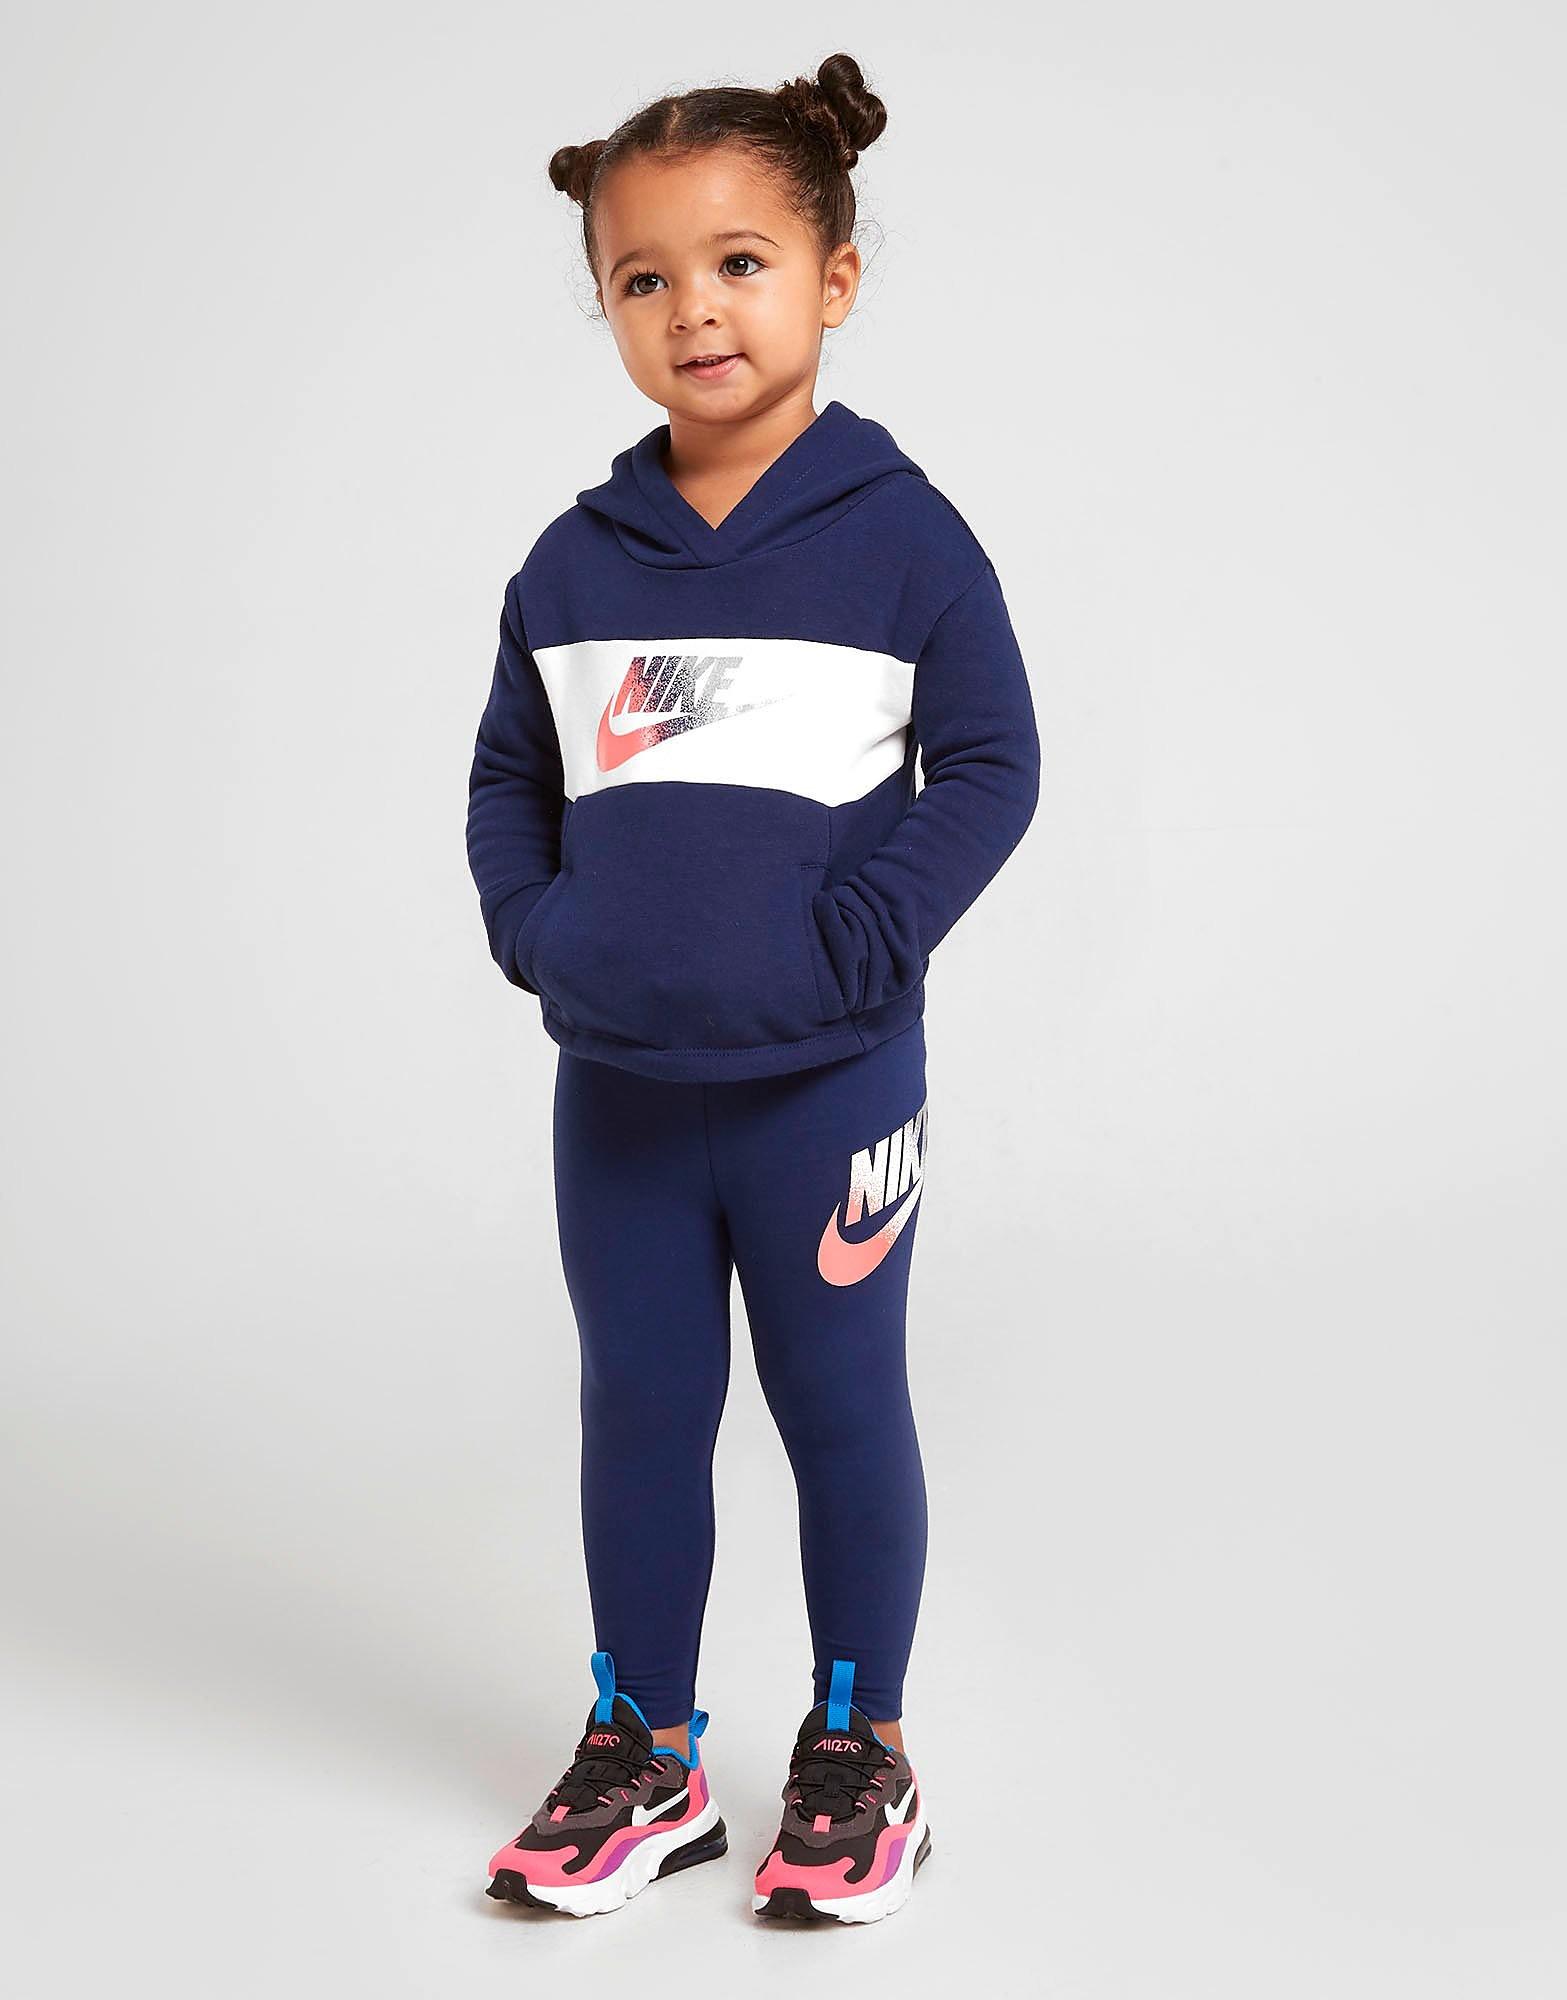 Nike Girls Shine Overhead Trainingspak Baby's alleen bij JD Blauw Kind B